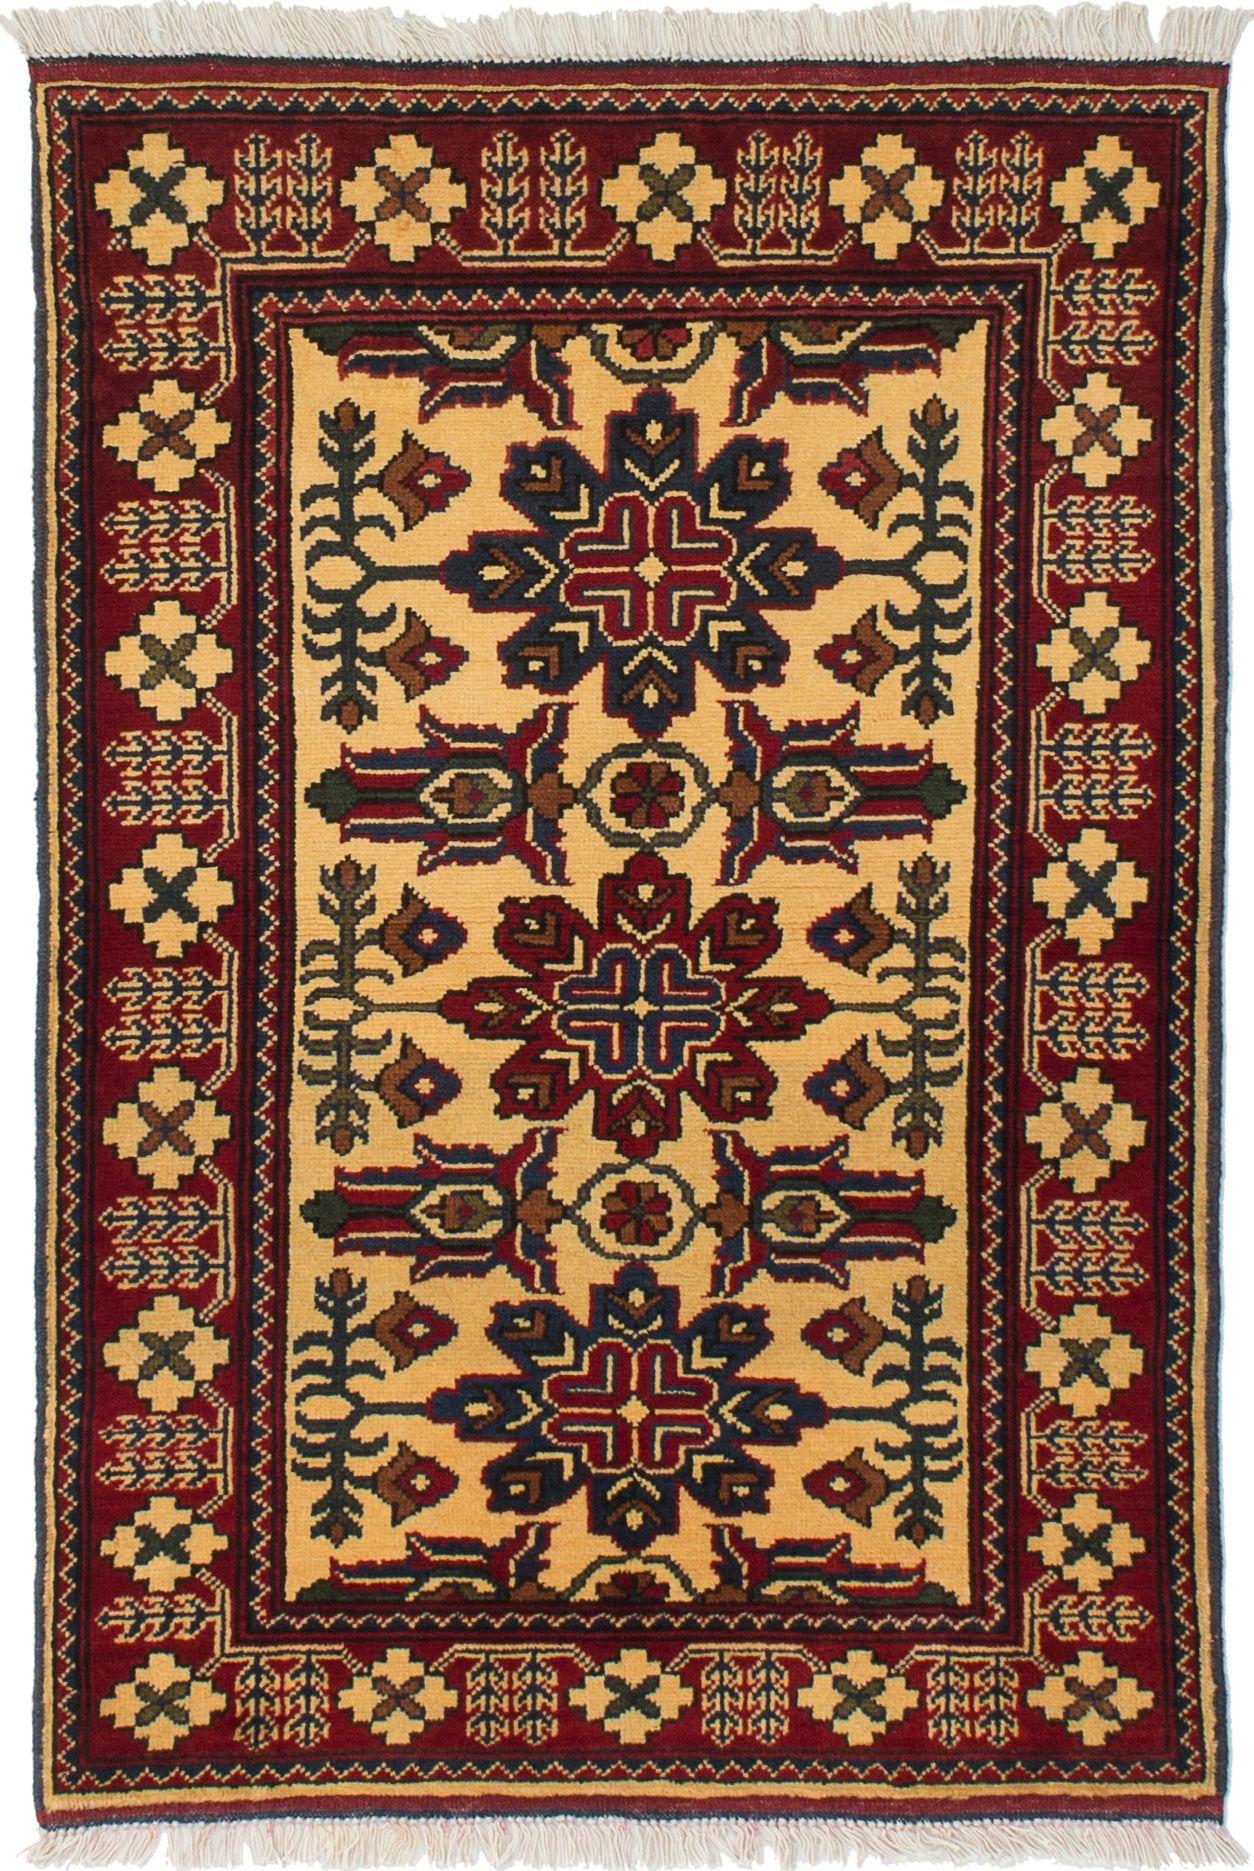 "Hand-knotted Finest Kargahi Cream Wool Rug 2'9"" x 4'2"" Size: 2'9"" x 4'2"""